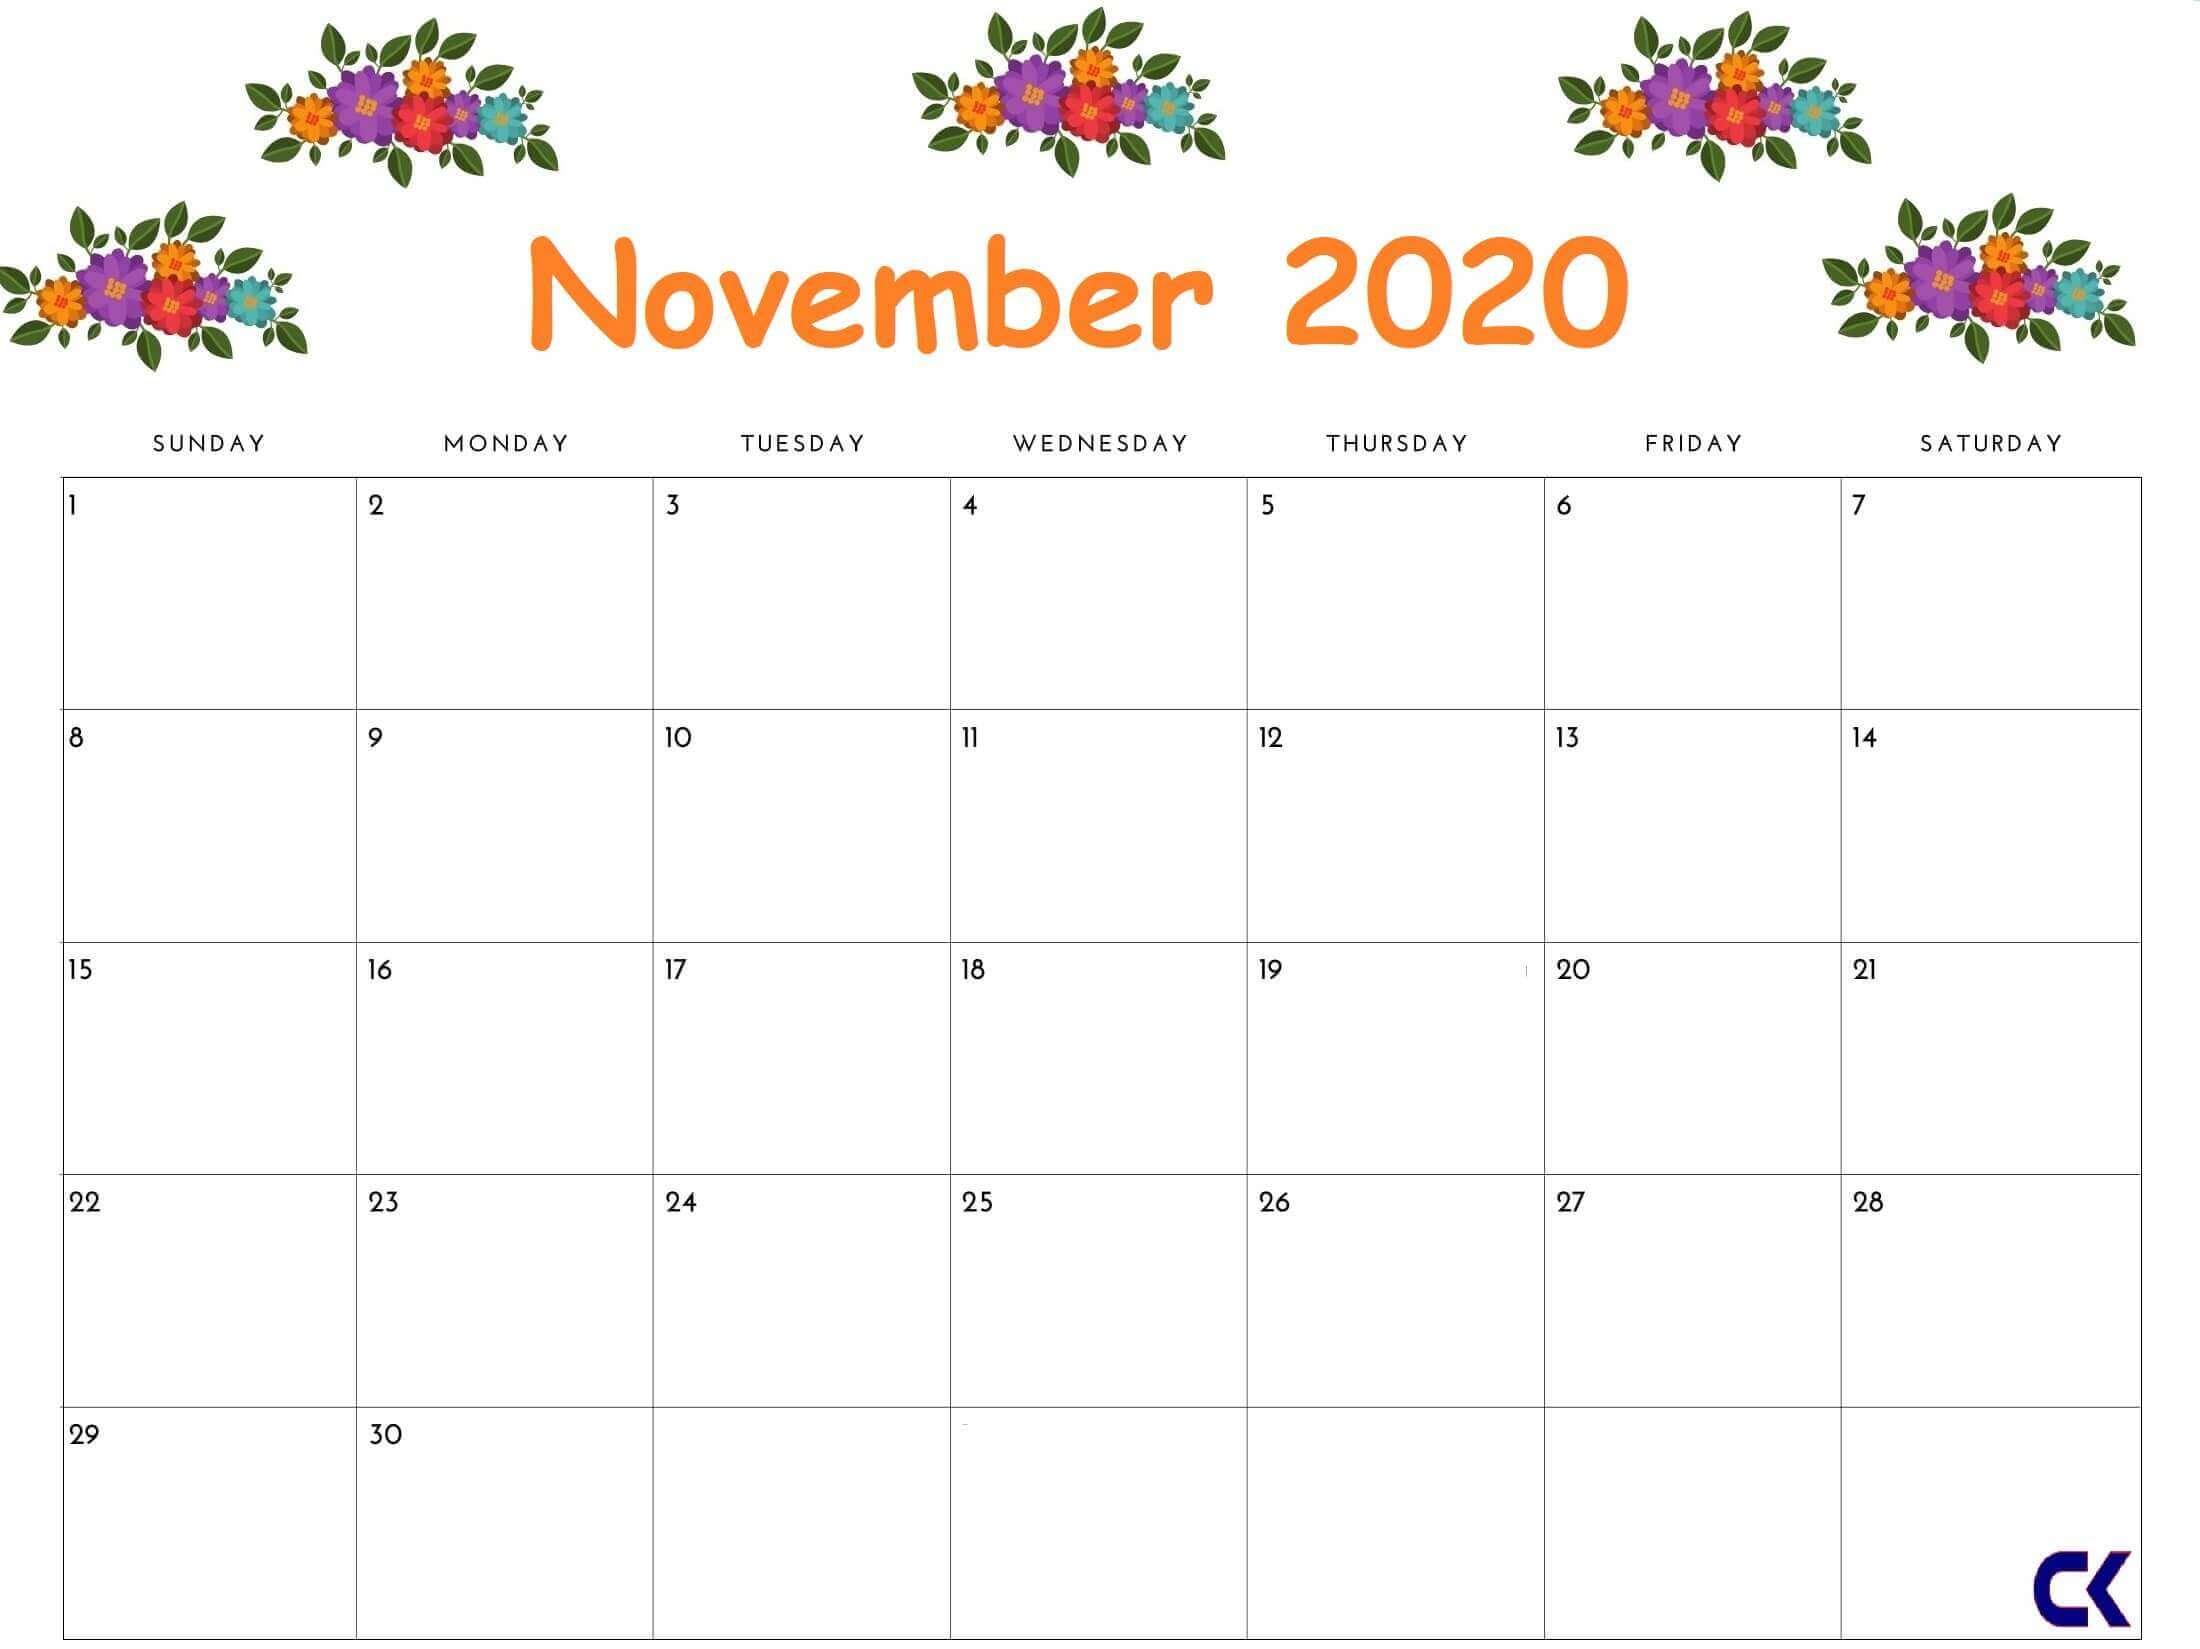 November 2020 Calendar Printable Floral